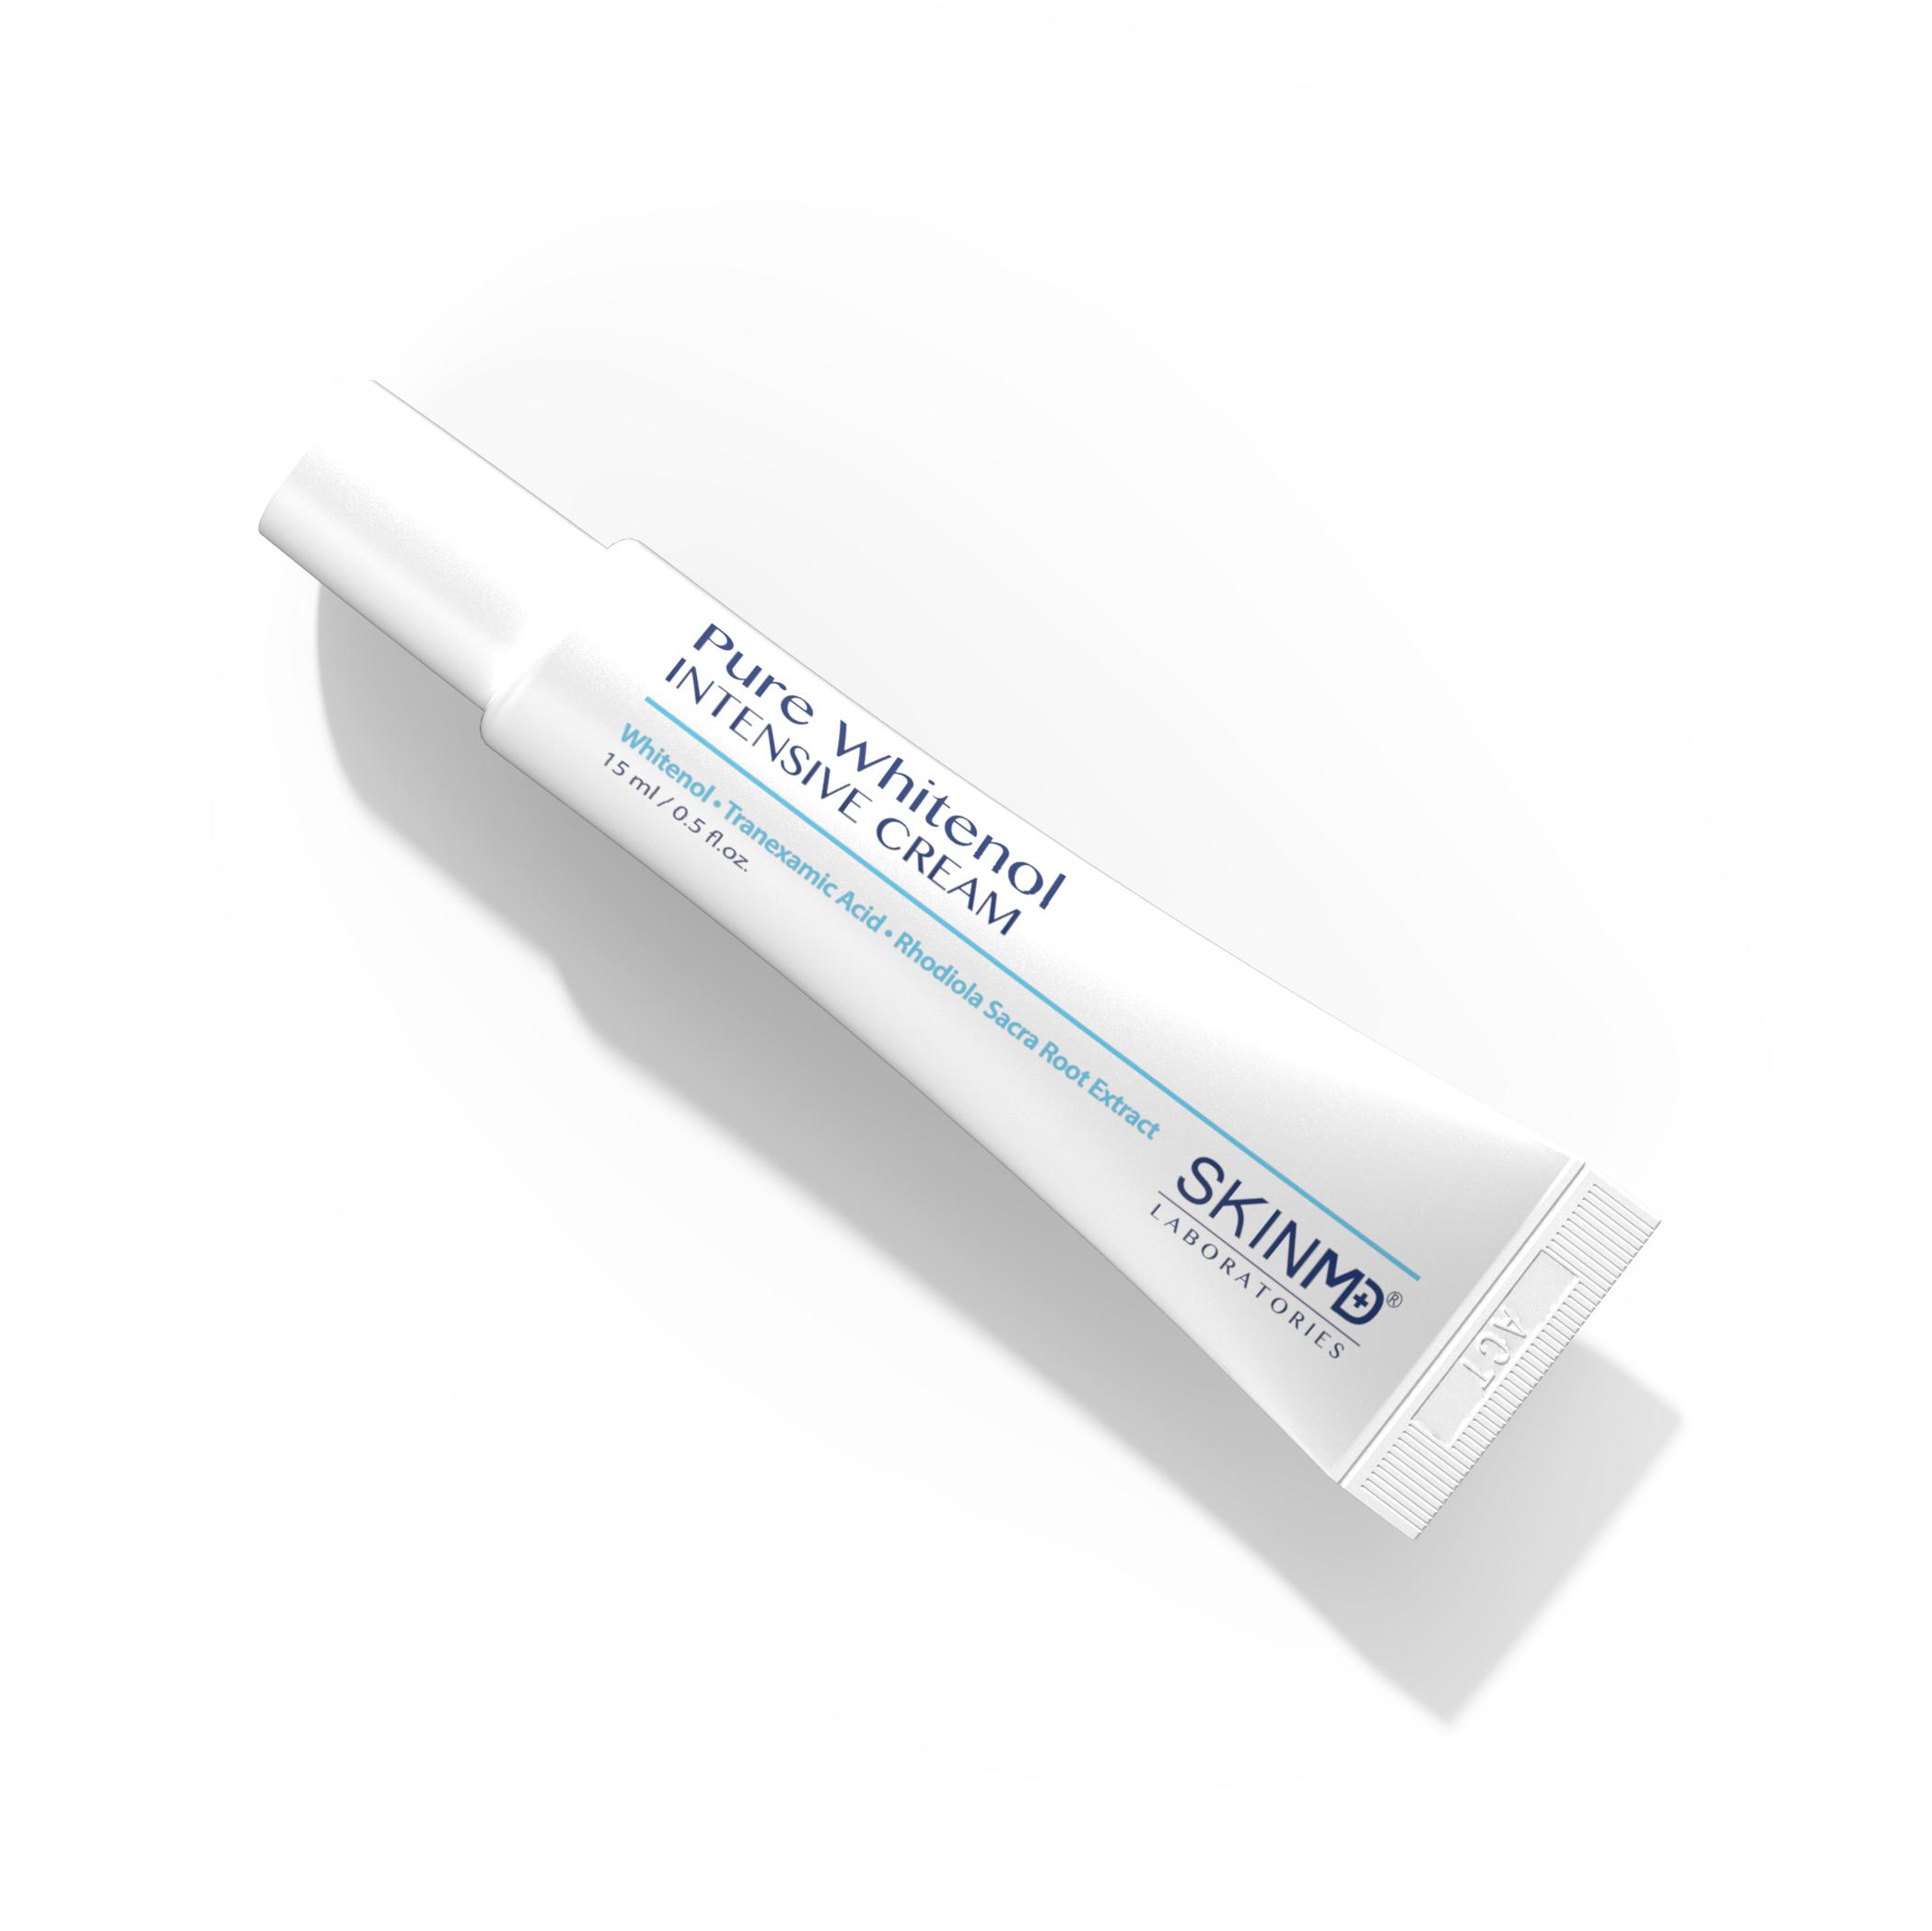 Kem trị nám và tái tạo da SkinMD Pure Whitenol Cream